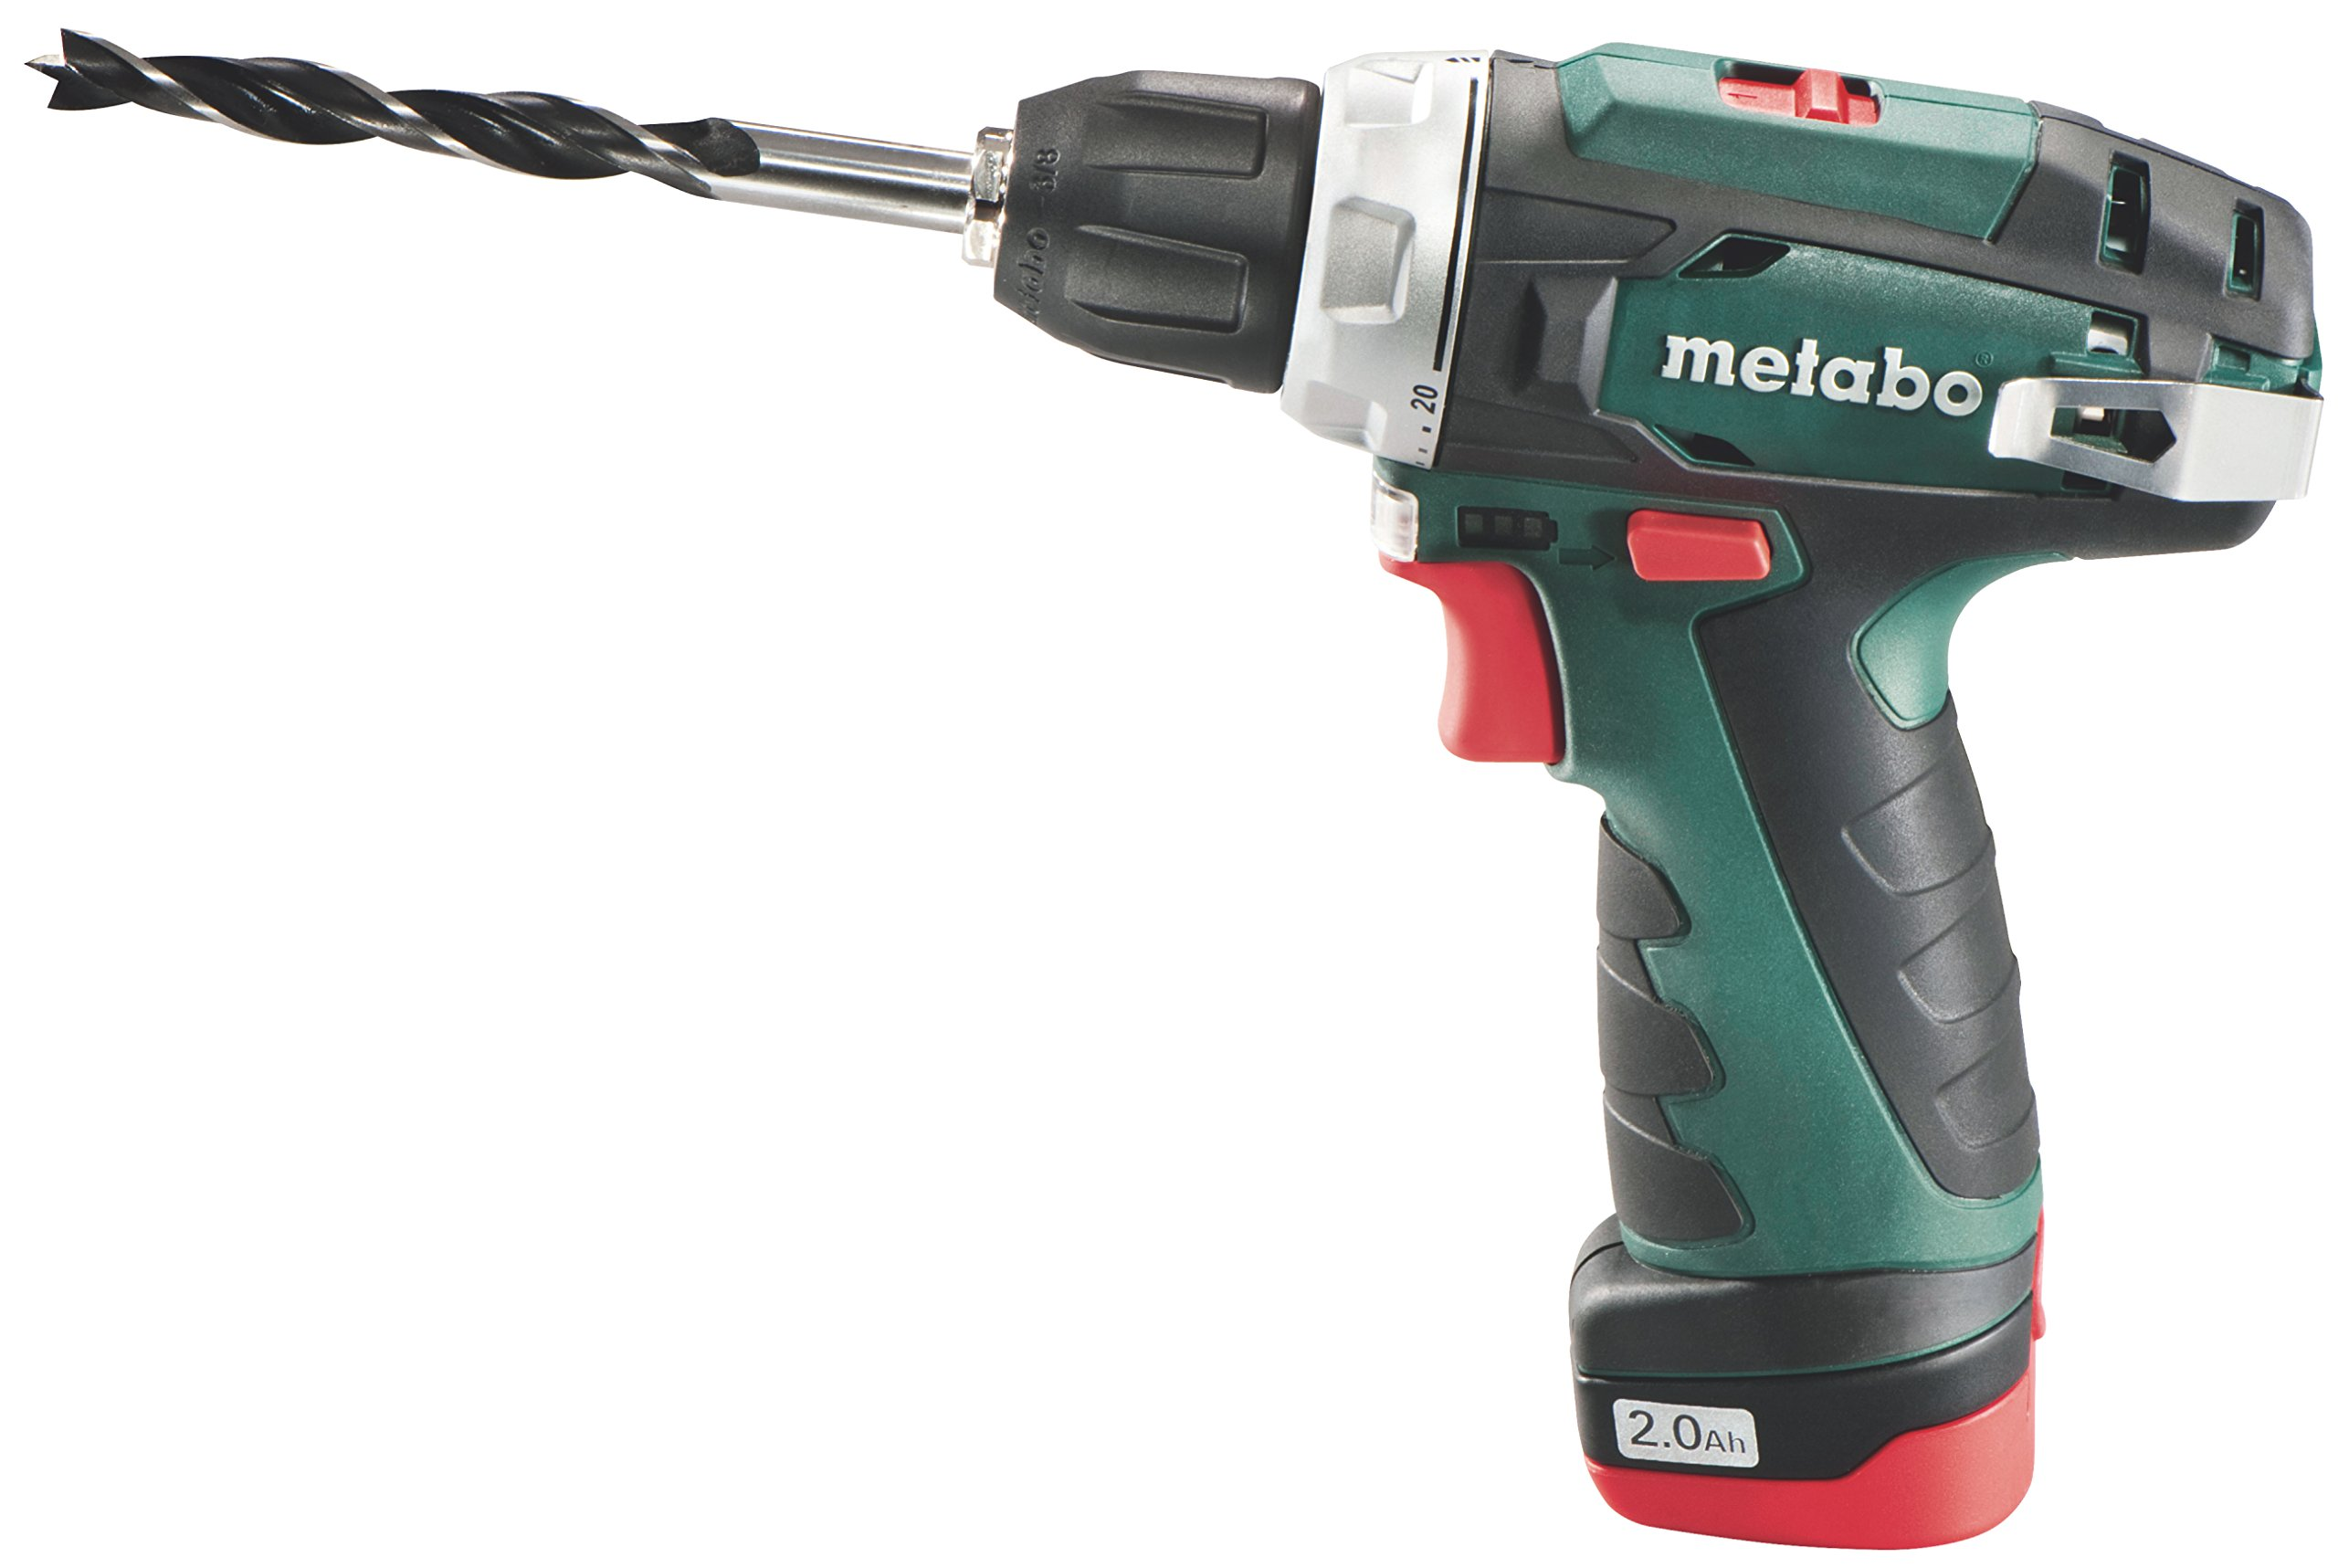 Metabo-600080500-PowerMaxx-BS-Basic-Akku-Bohrschrauber-108-V-Schwarz